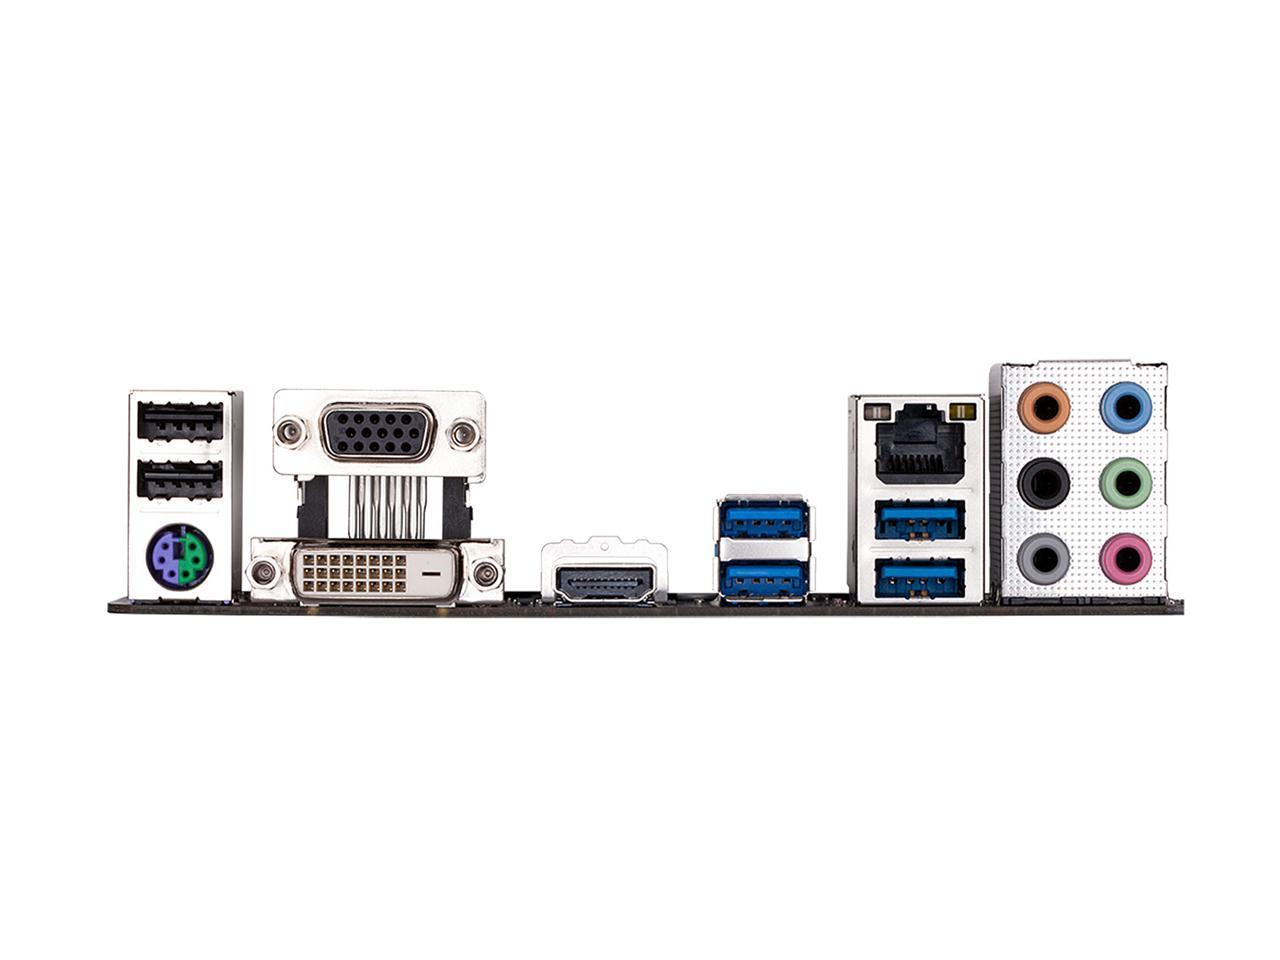 Gigabyte B365 Hd3 Lga Intel B365 Sata Usb 3 1 Atx